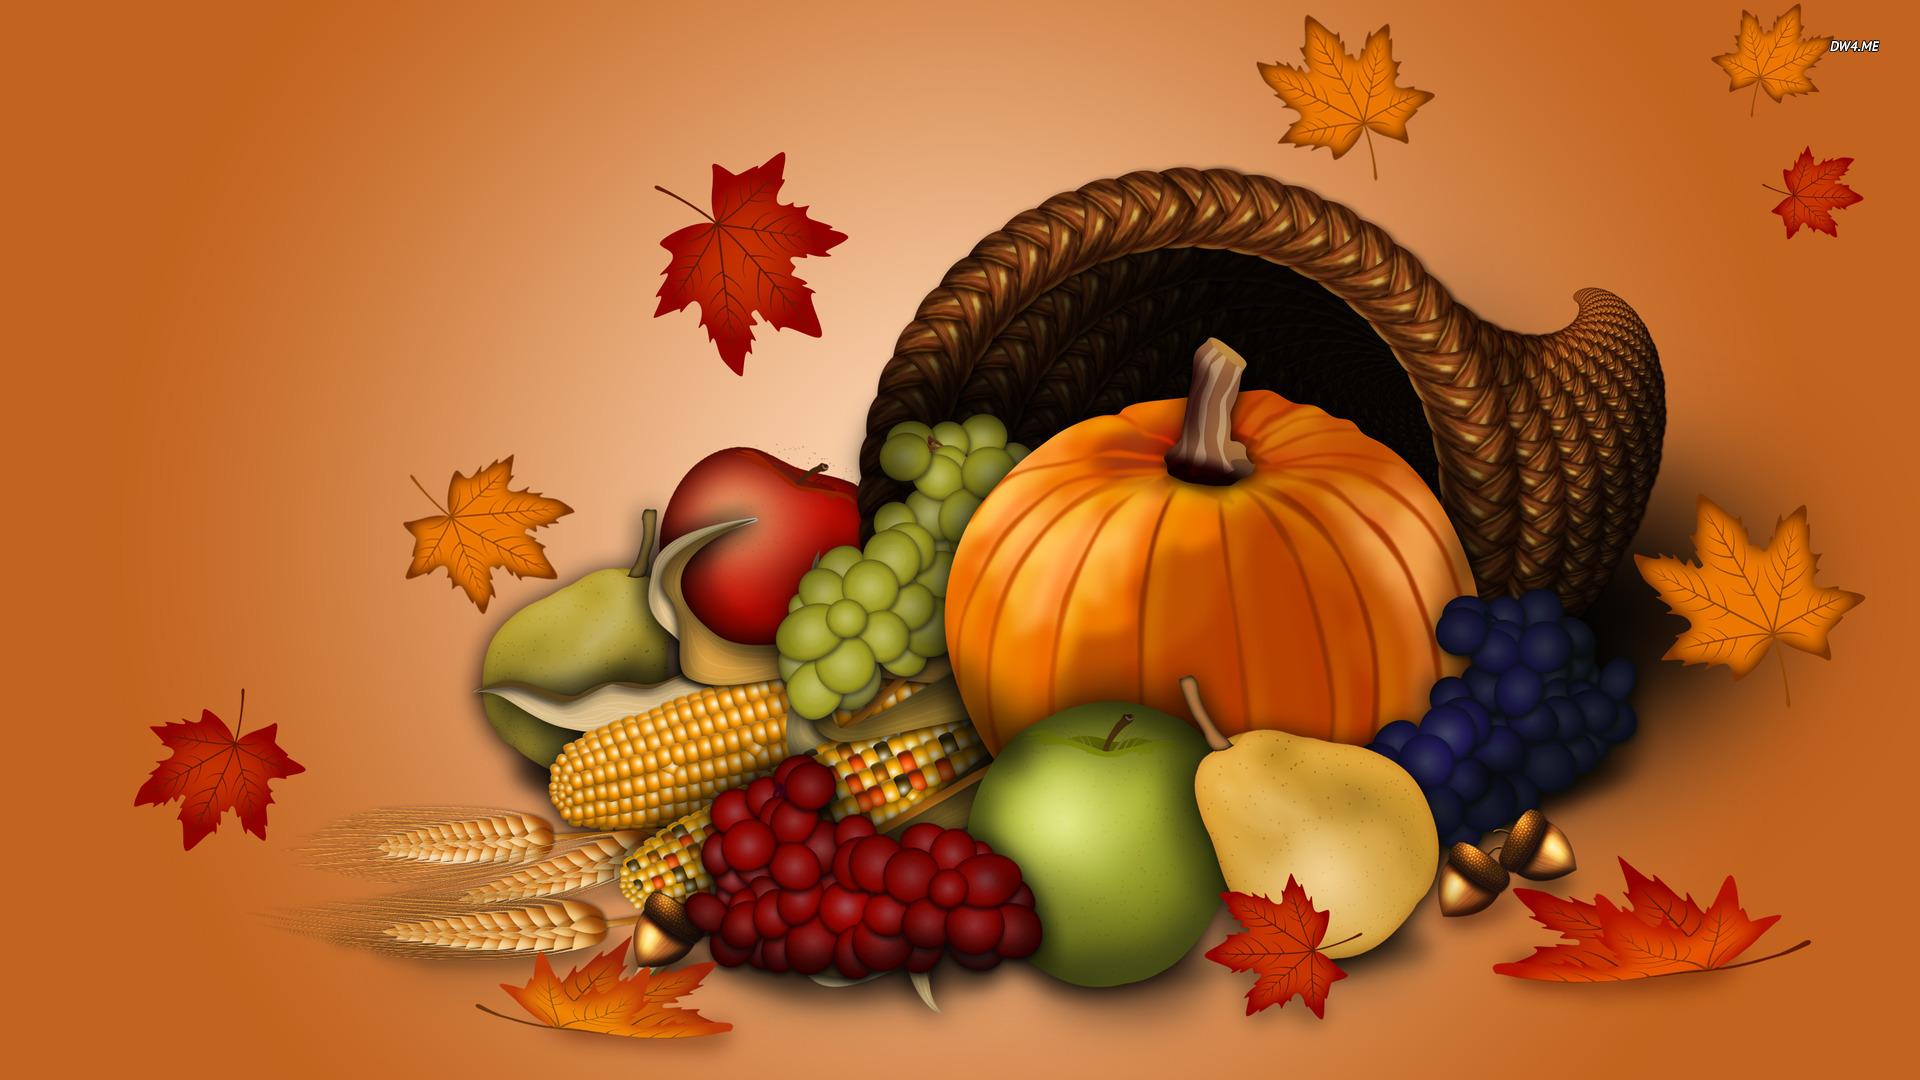 thanksgiving wallpapers beautiful